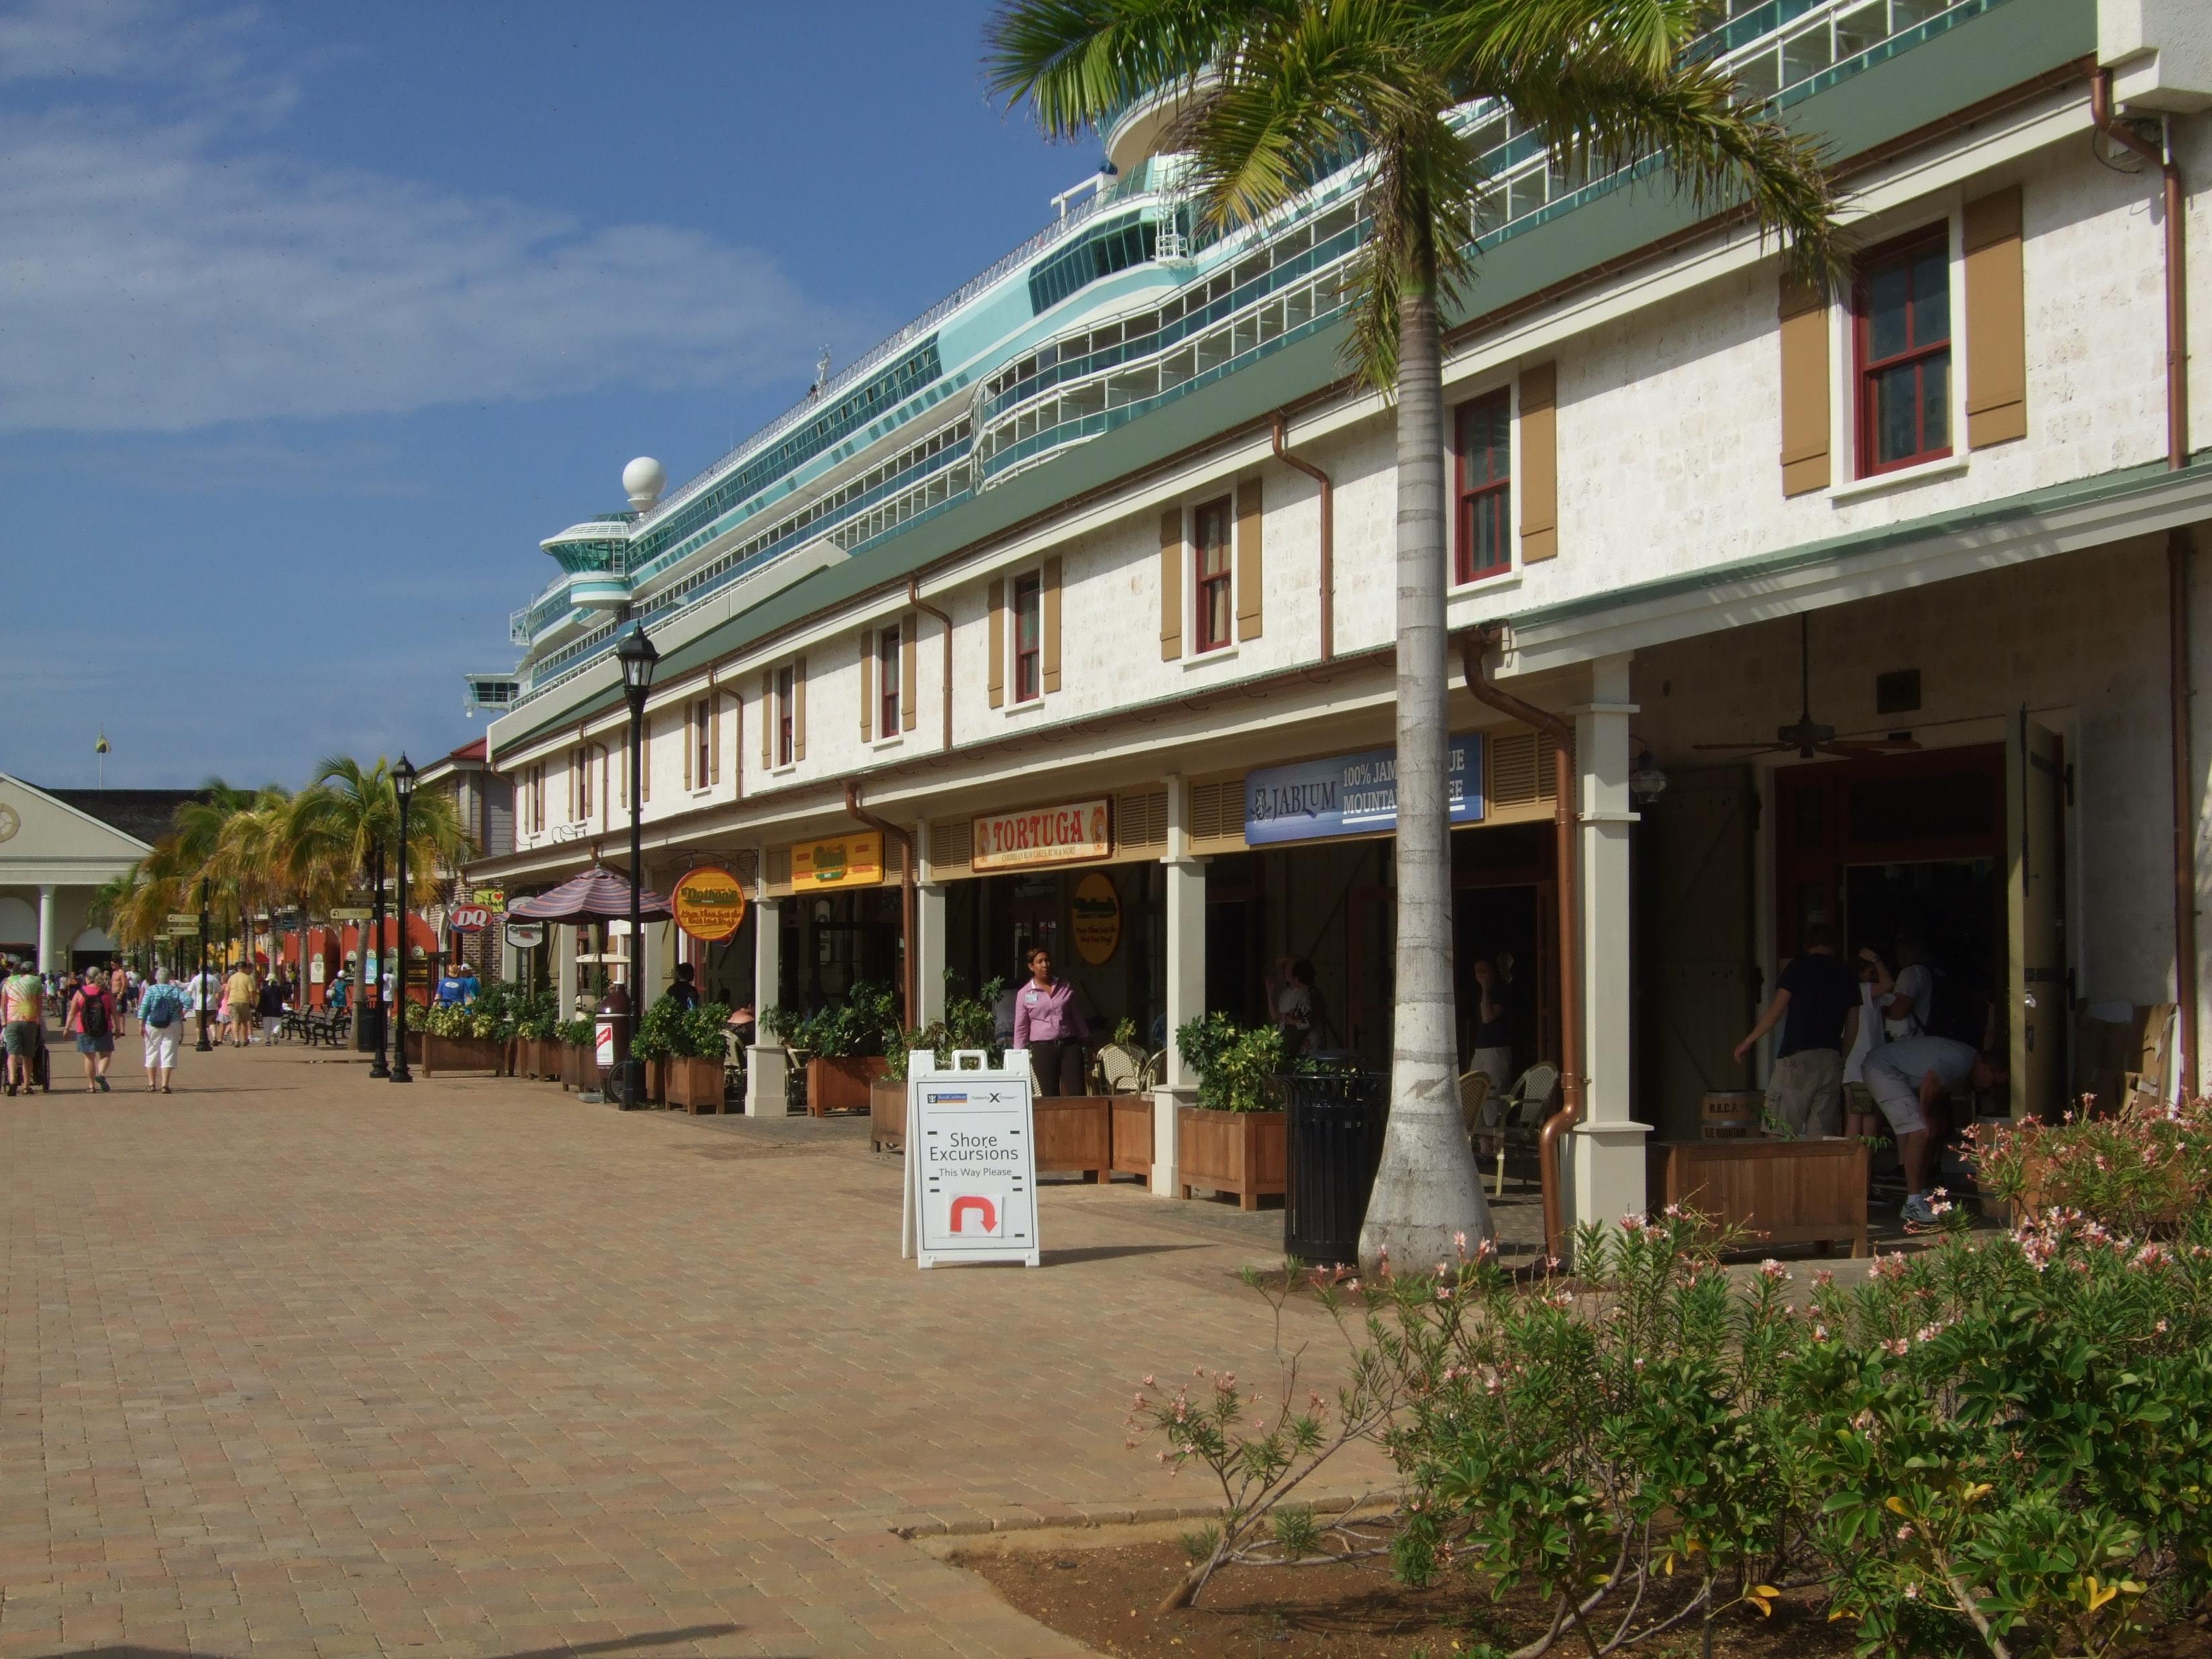 Falmouth Jamaica Disney Cruise Line Shore Excursions